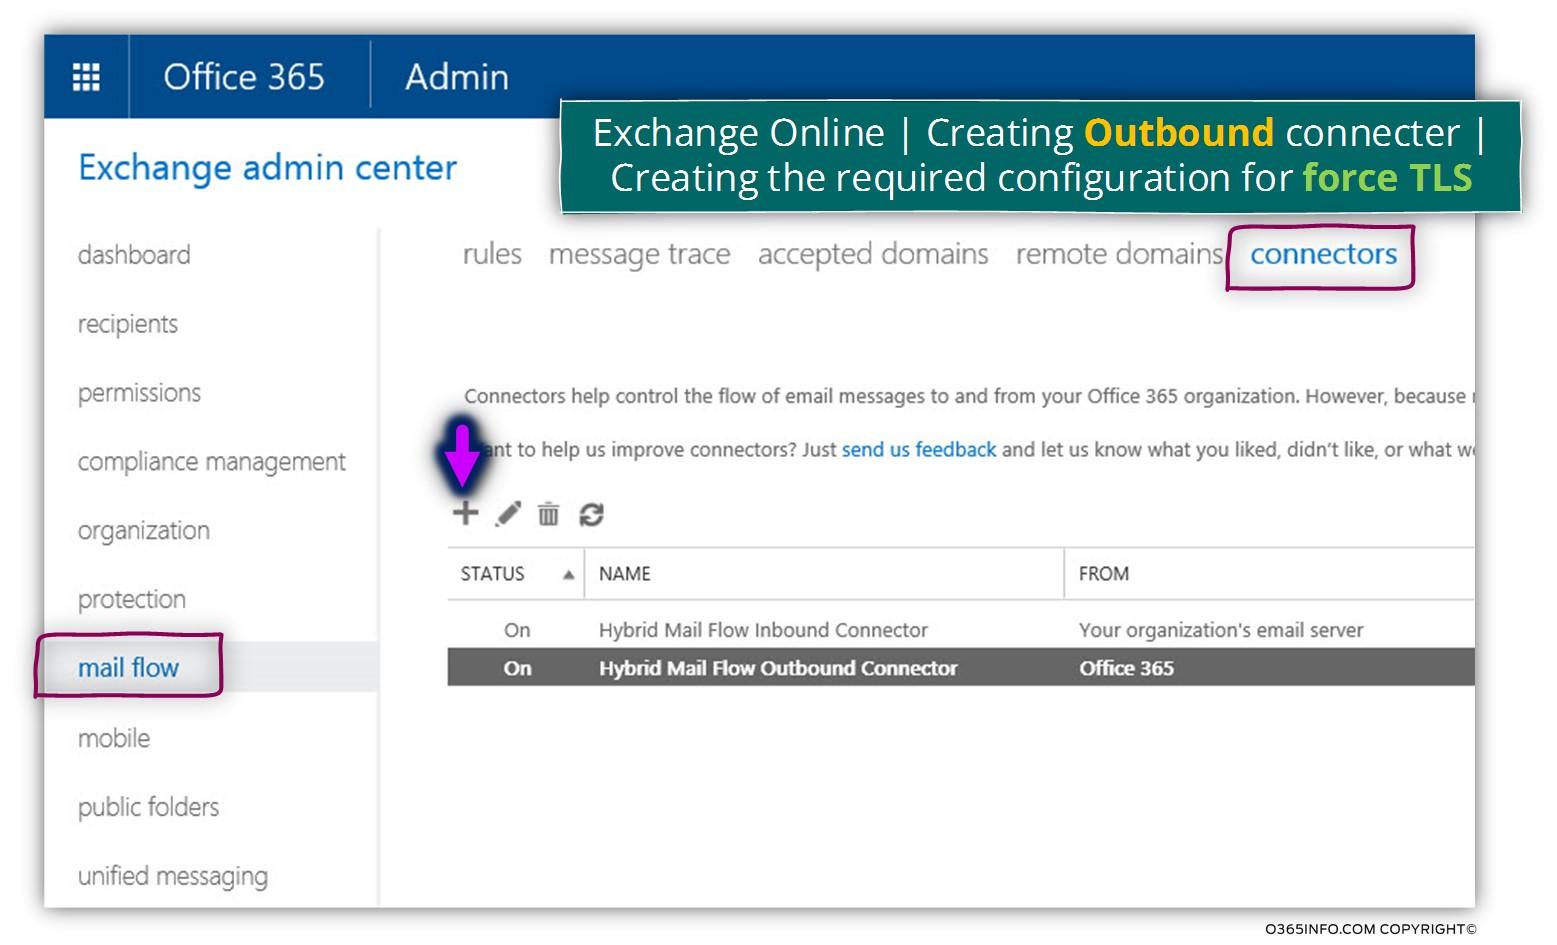 Creating a custom force TLS - Exchange Online send connector -01